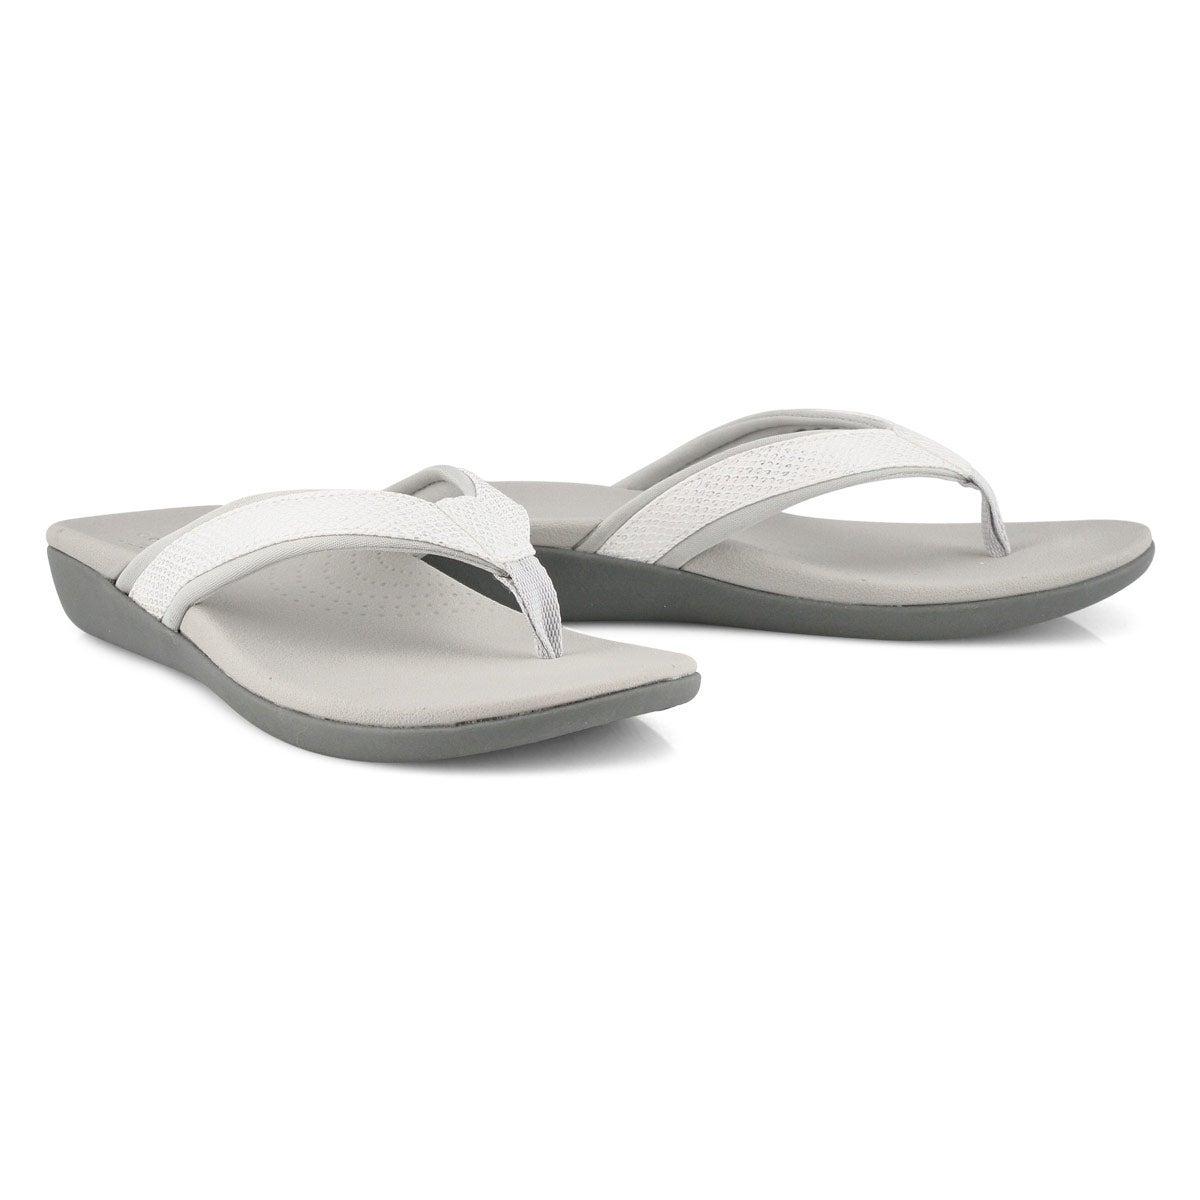 Women's Brio Sol Casual Sandal - White Snake